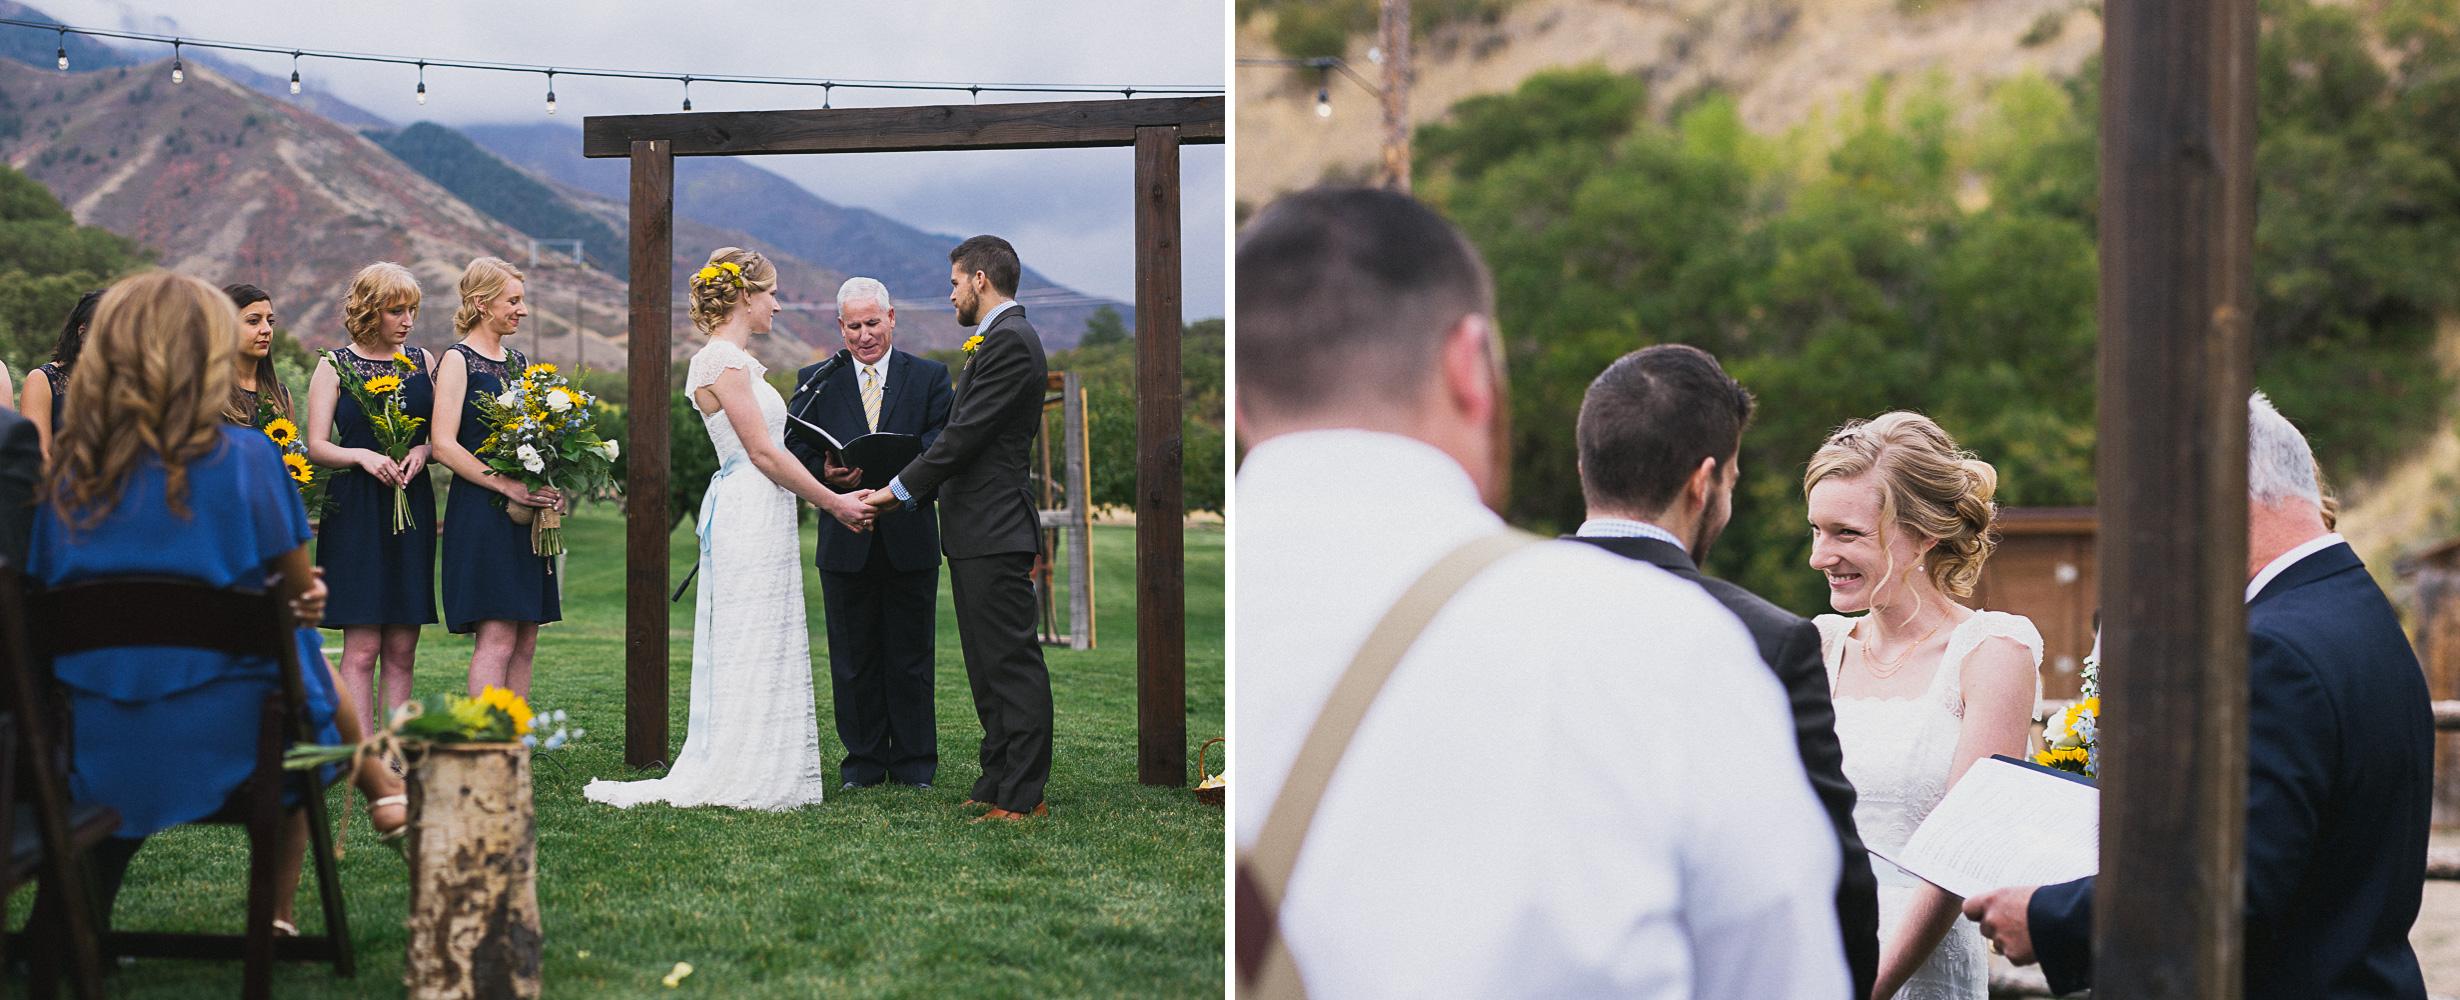 Salt-Lake-City-Wedding-Photographer-Utah-010.jpg